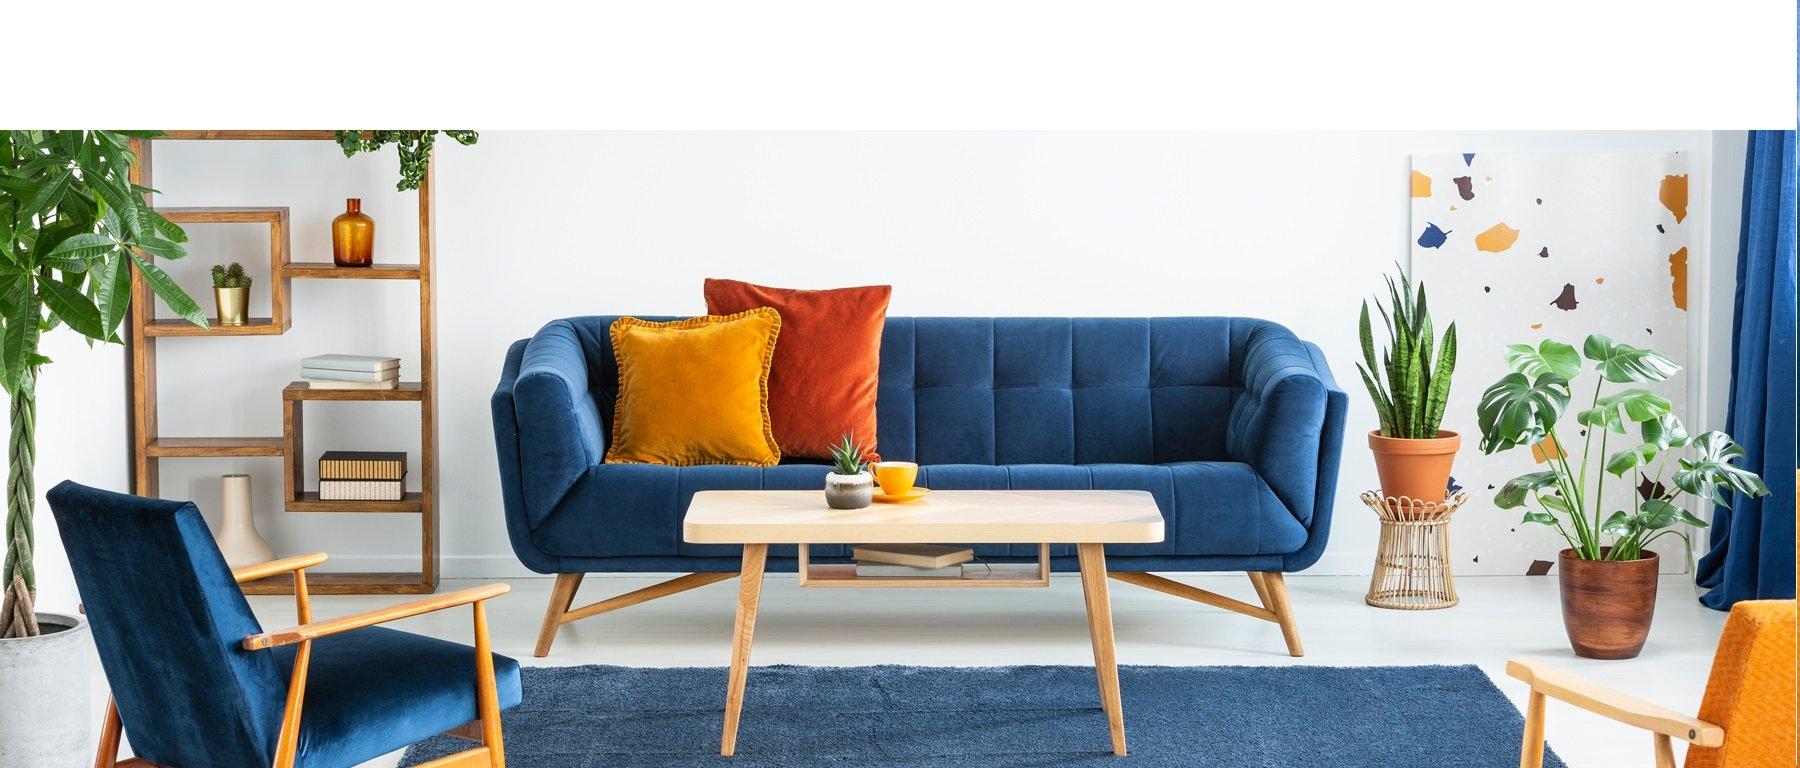 Affiliate Home Insurance - TopCashBack | esure